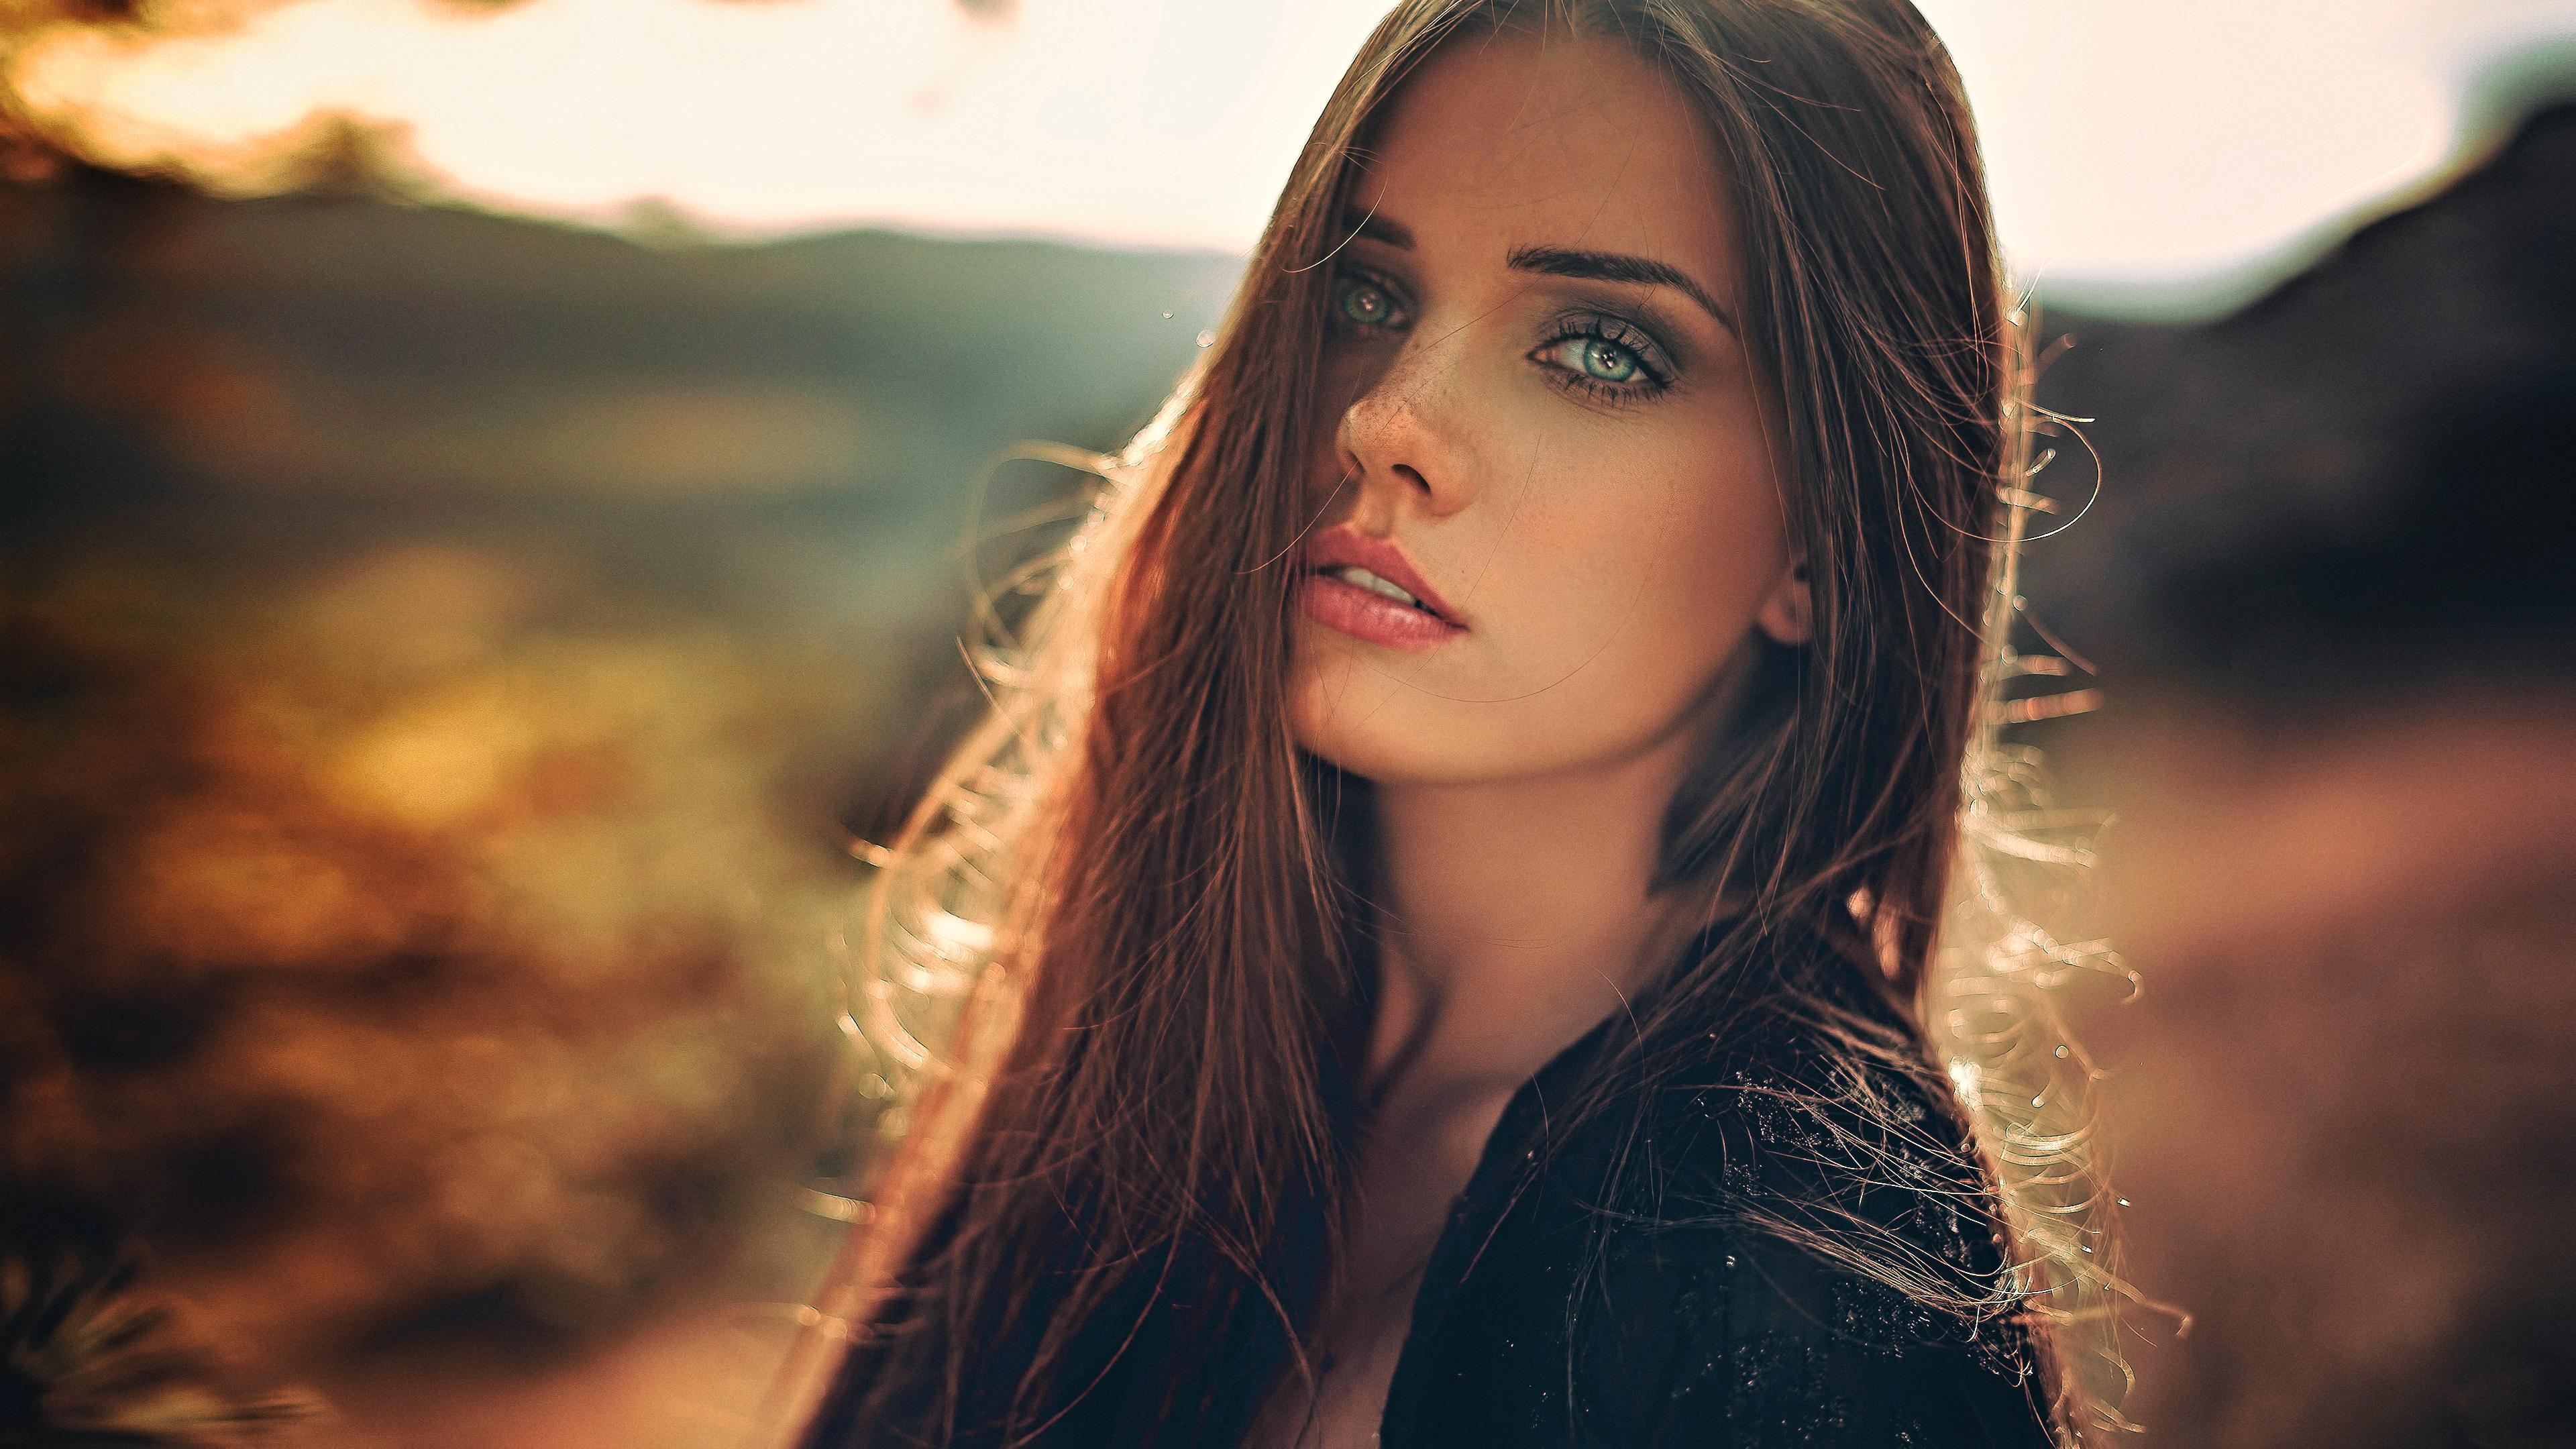 People 3840x2160 looking at viewer model portrait women photography face sunlight depth of field brunette pink lipstick Anne Hoffmann